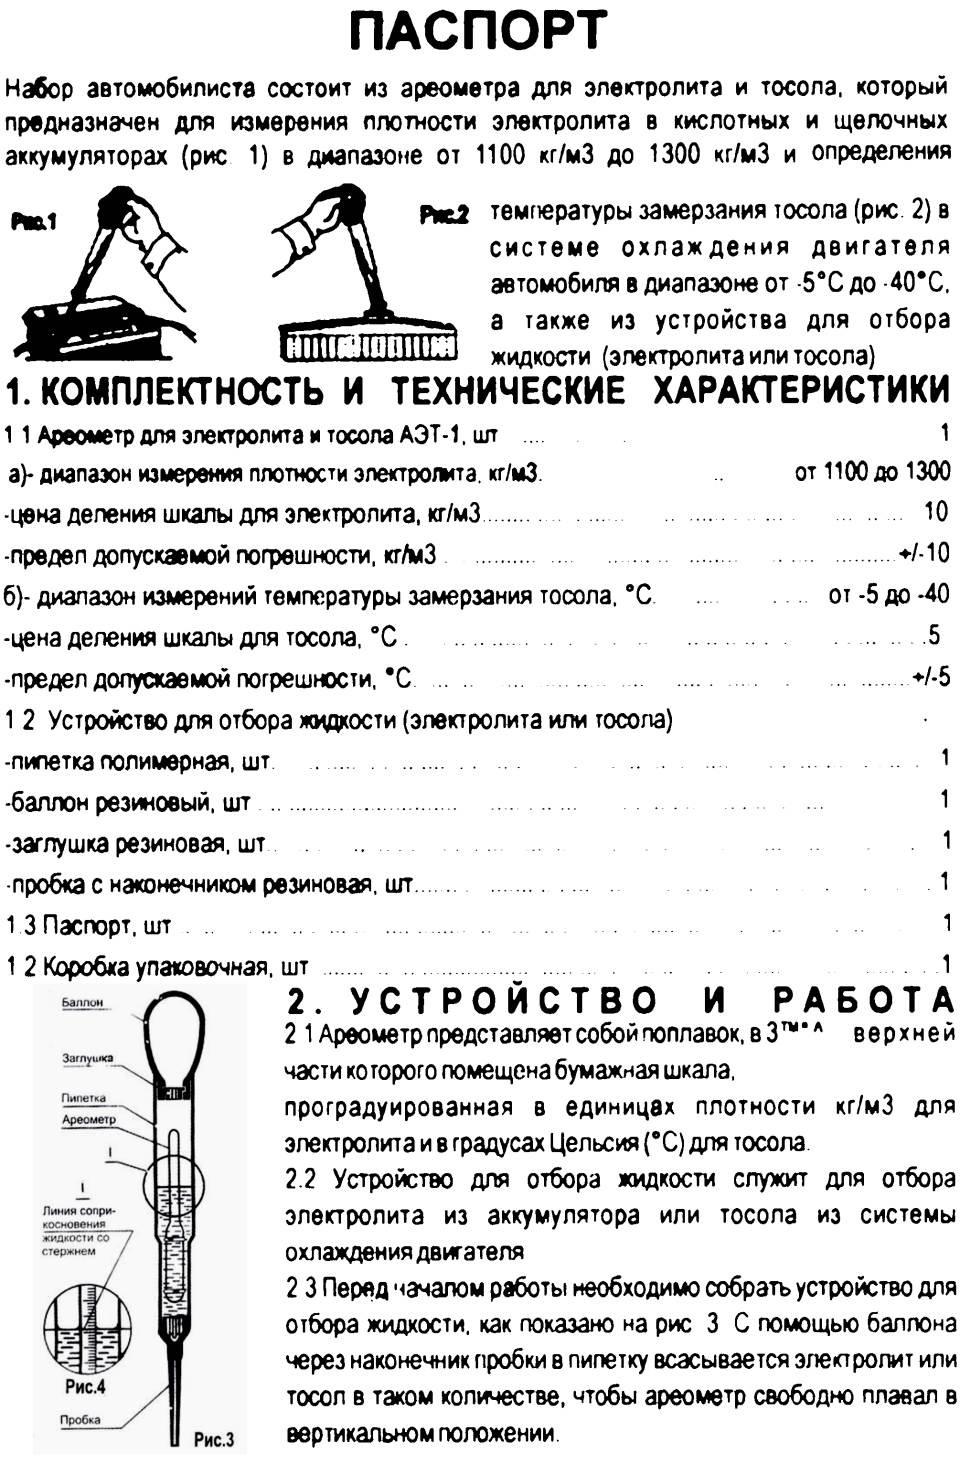 Инструкция по эксплуатации ареометра